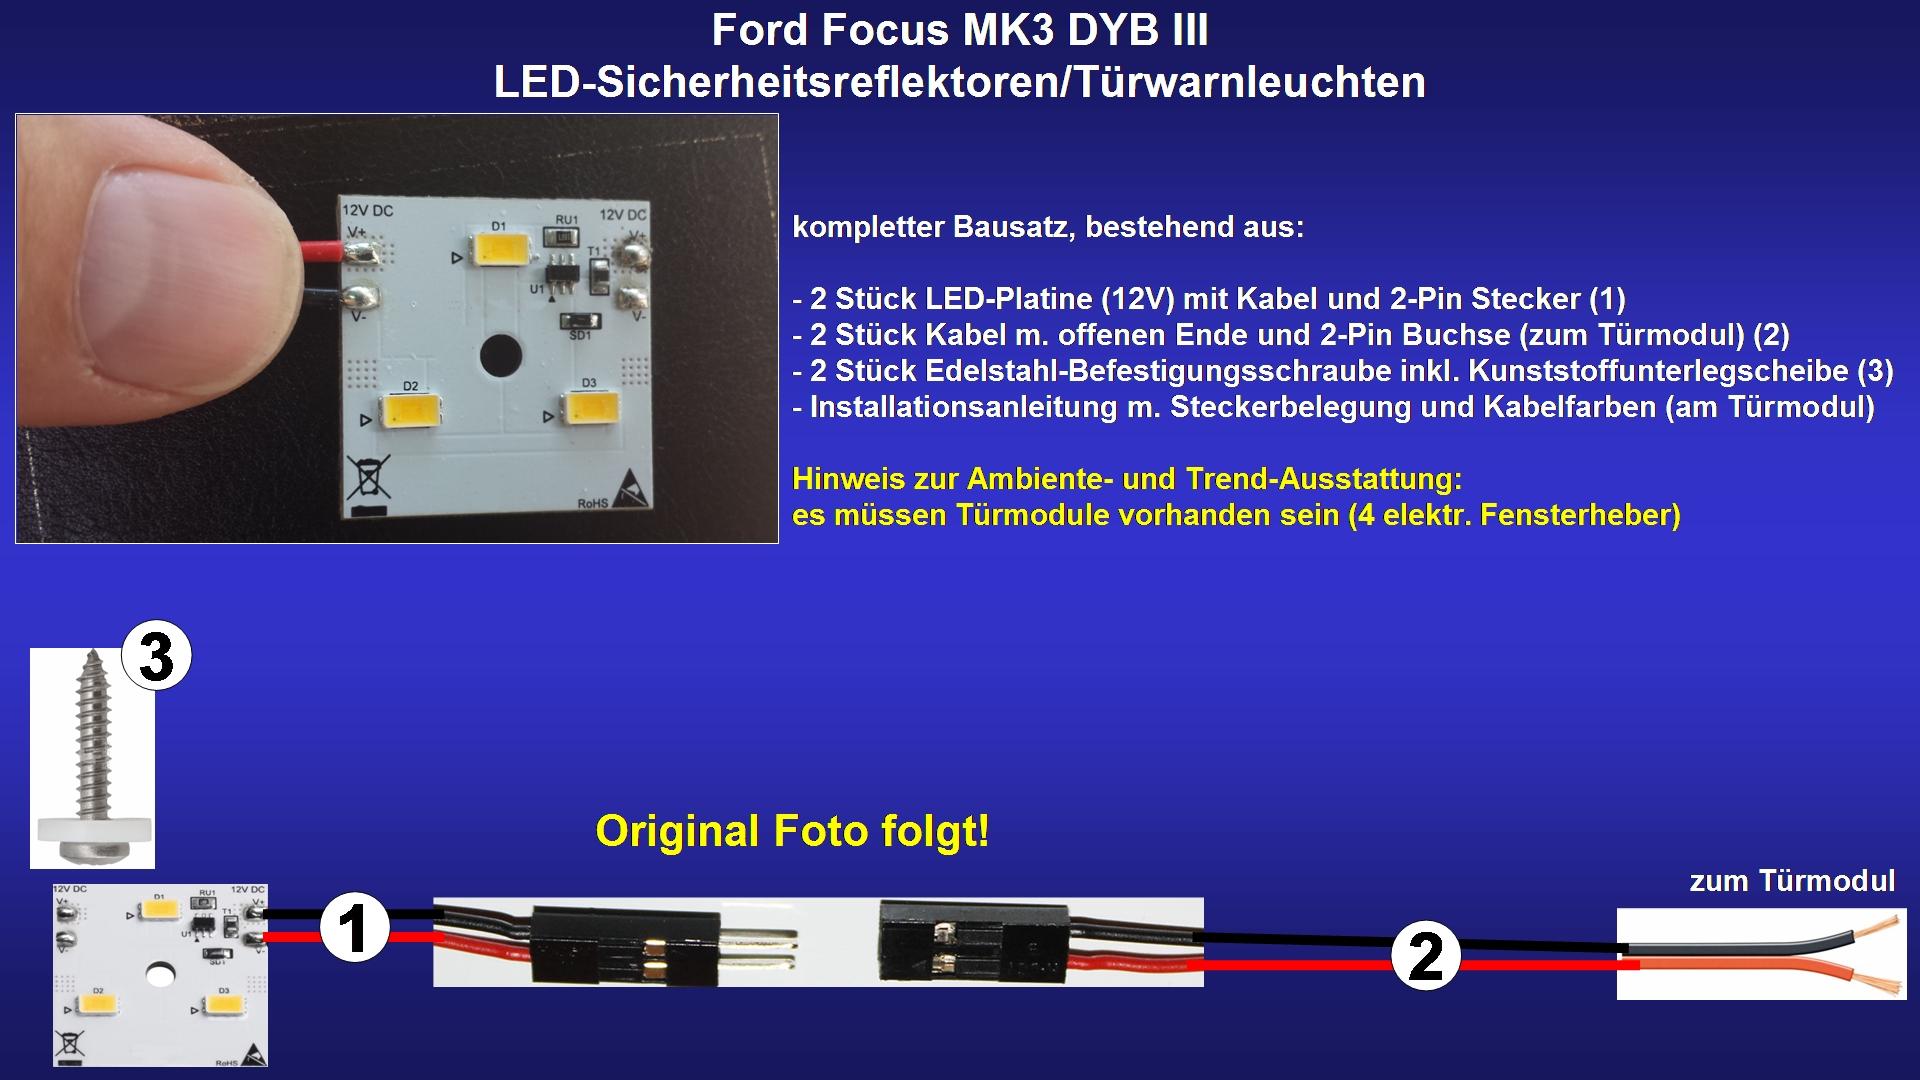 Großzügig 7 Pin Truck Stecker Schaltplan Ideen - Der Schaltplan ...